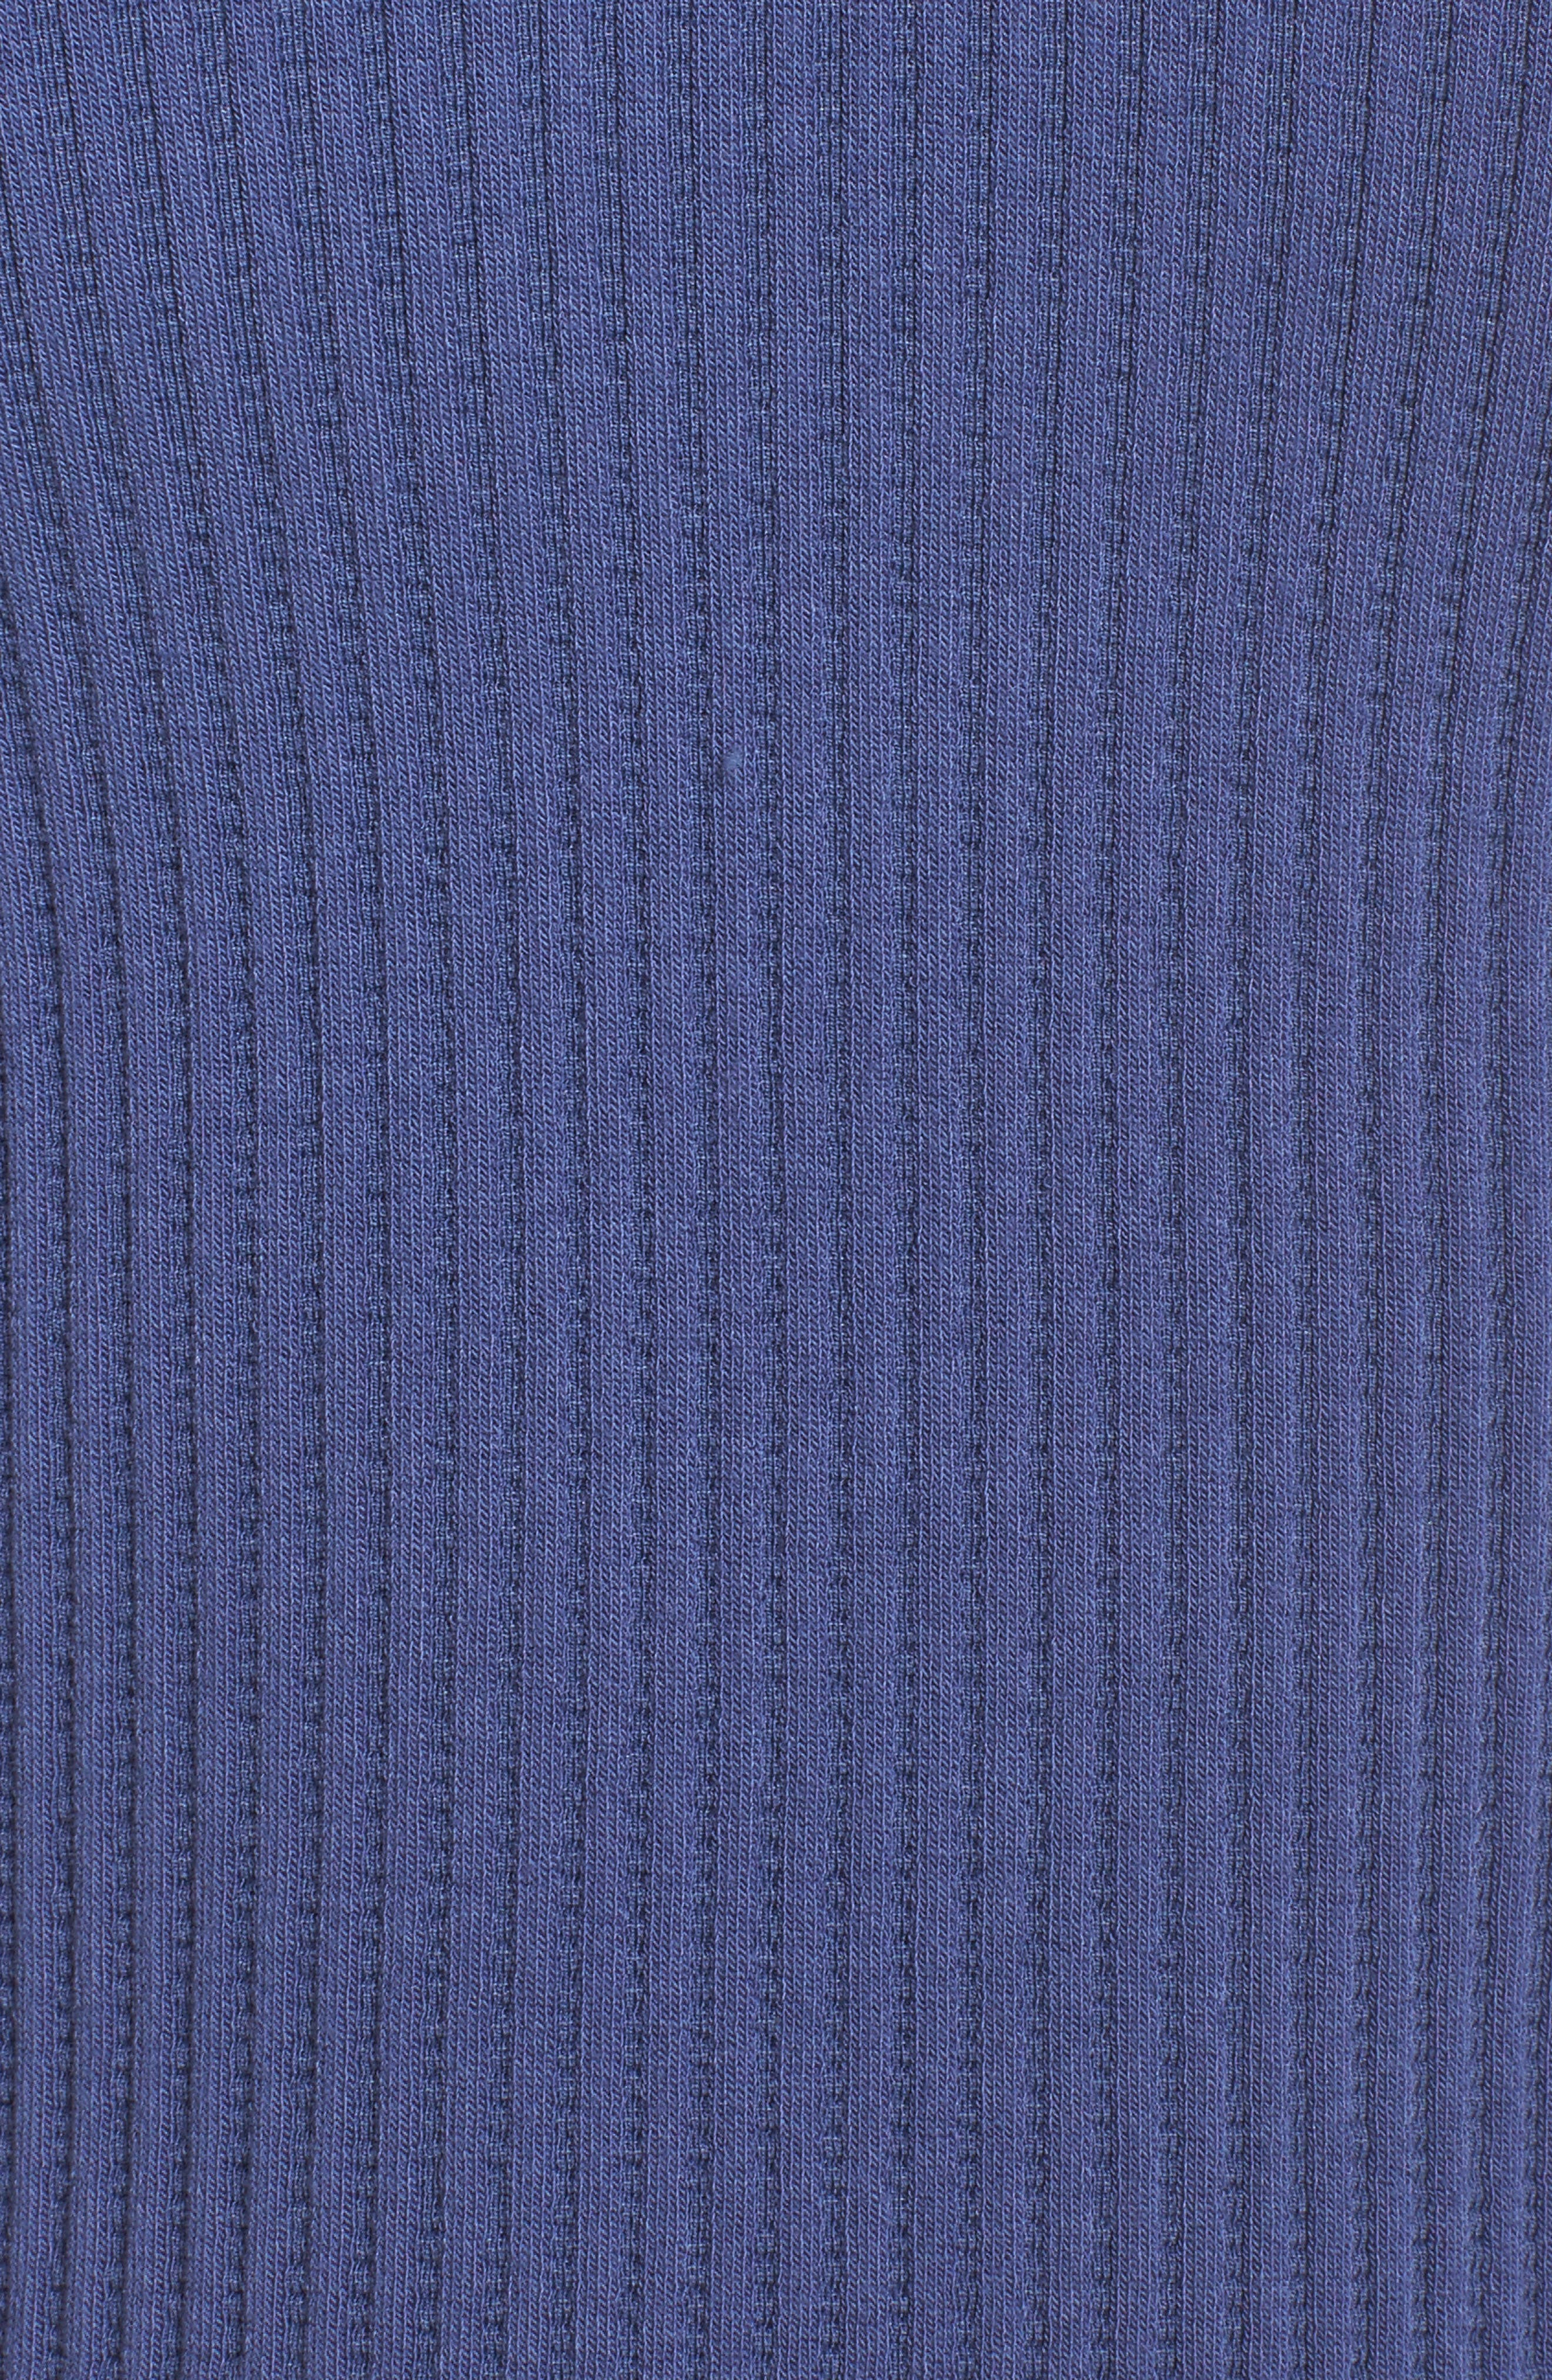 Alternate Image 6  - Free People Intimately FP Solid Rib Brami Crop Top